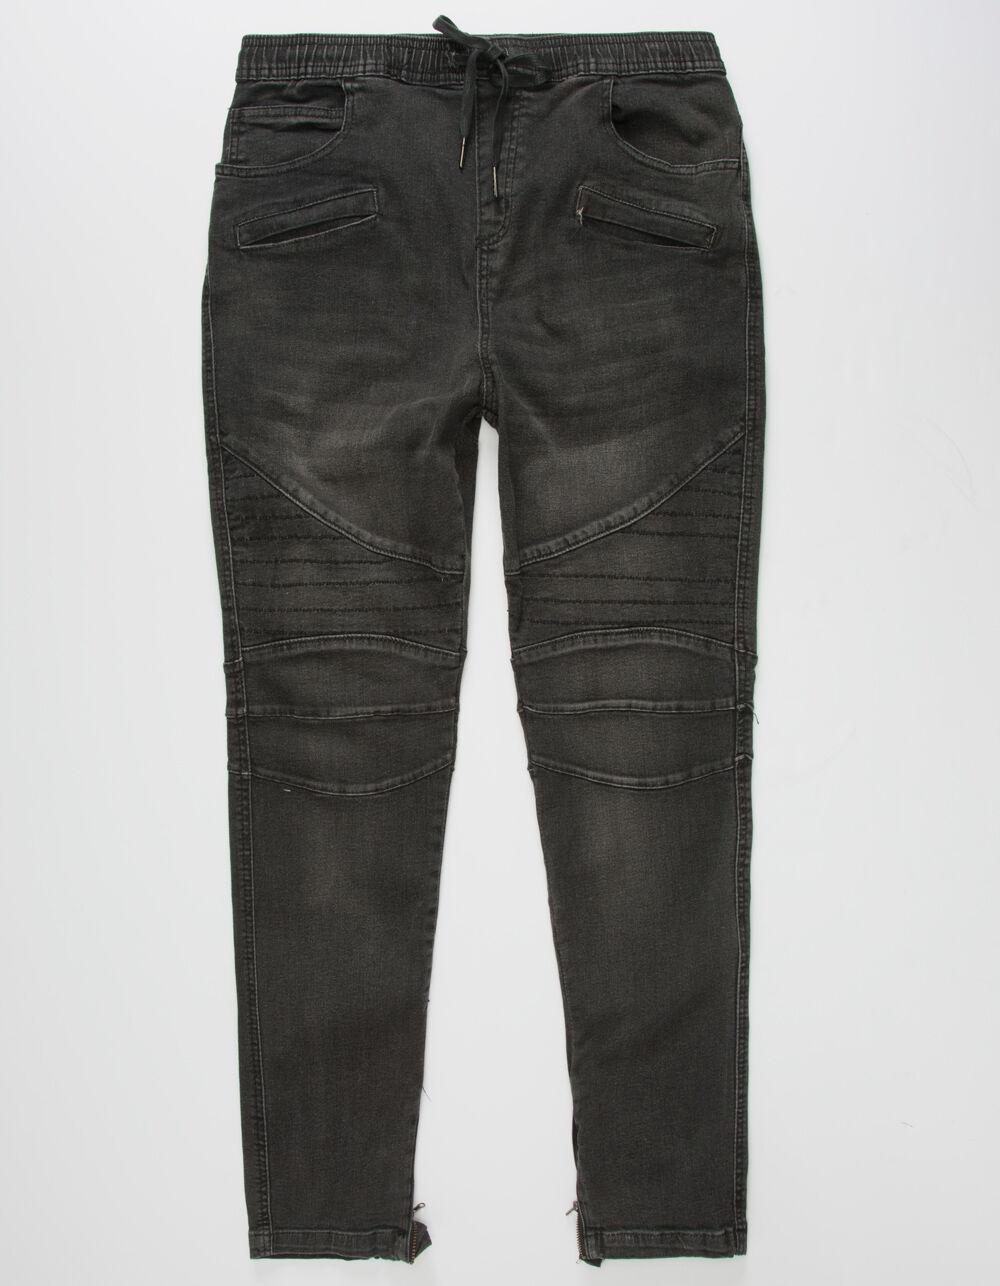 Image of BROOKLYN CLOTH DENIM MOTO JOGGER PANTS